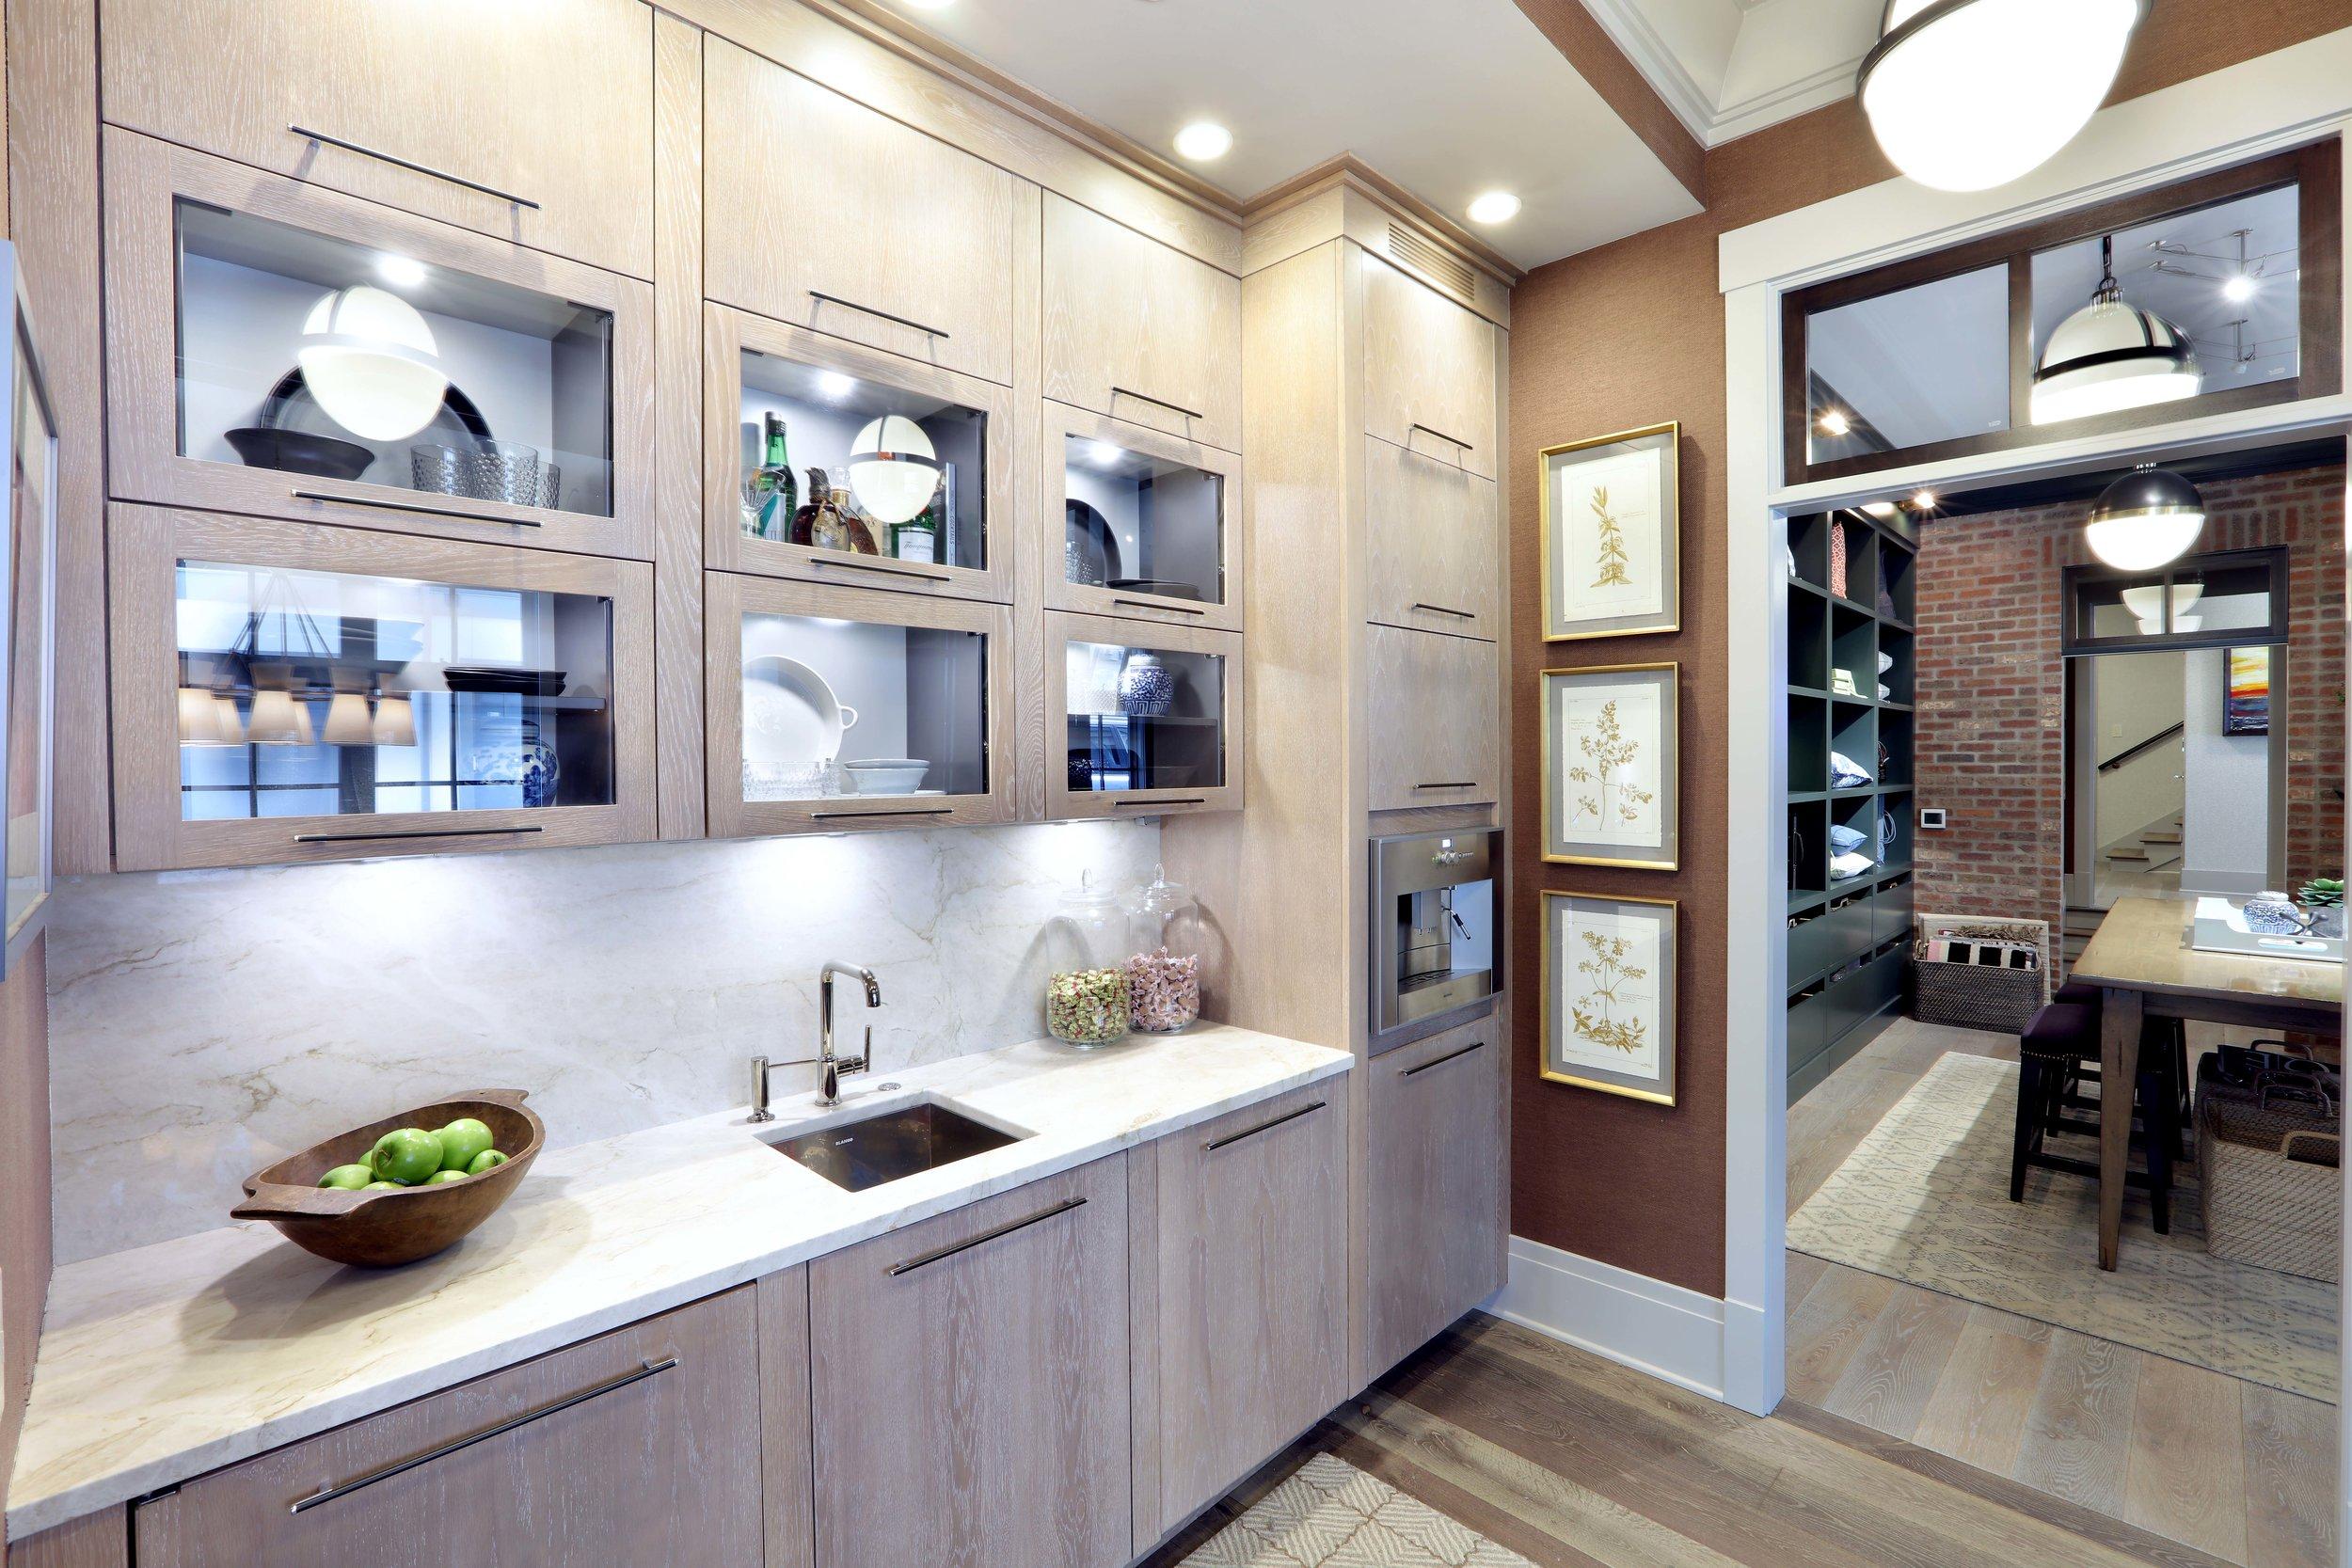 Vision-Interiors-Visbeen-Showroom-Grand-Rapids-Bar.jpg